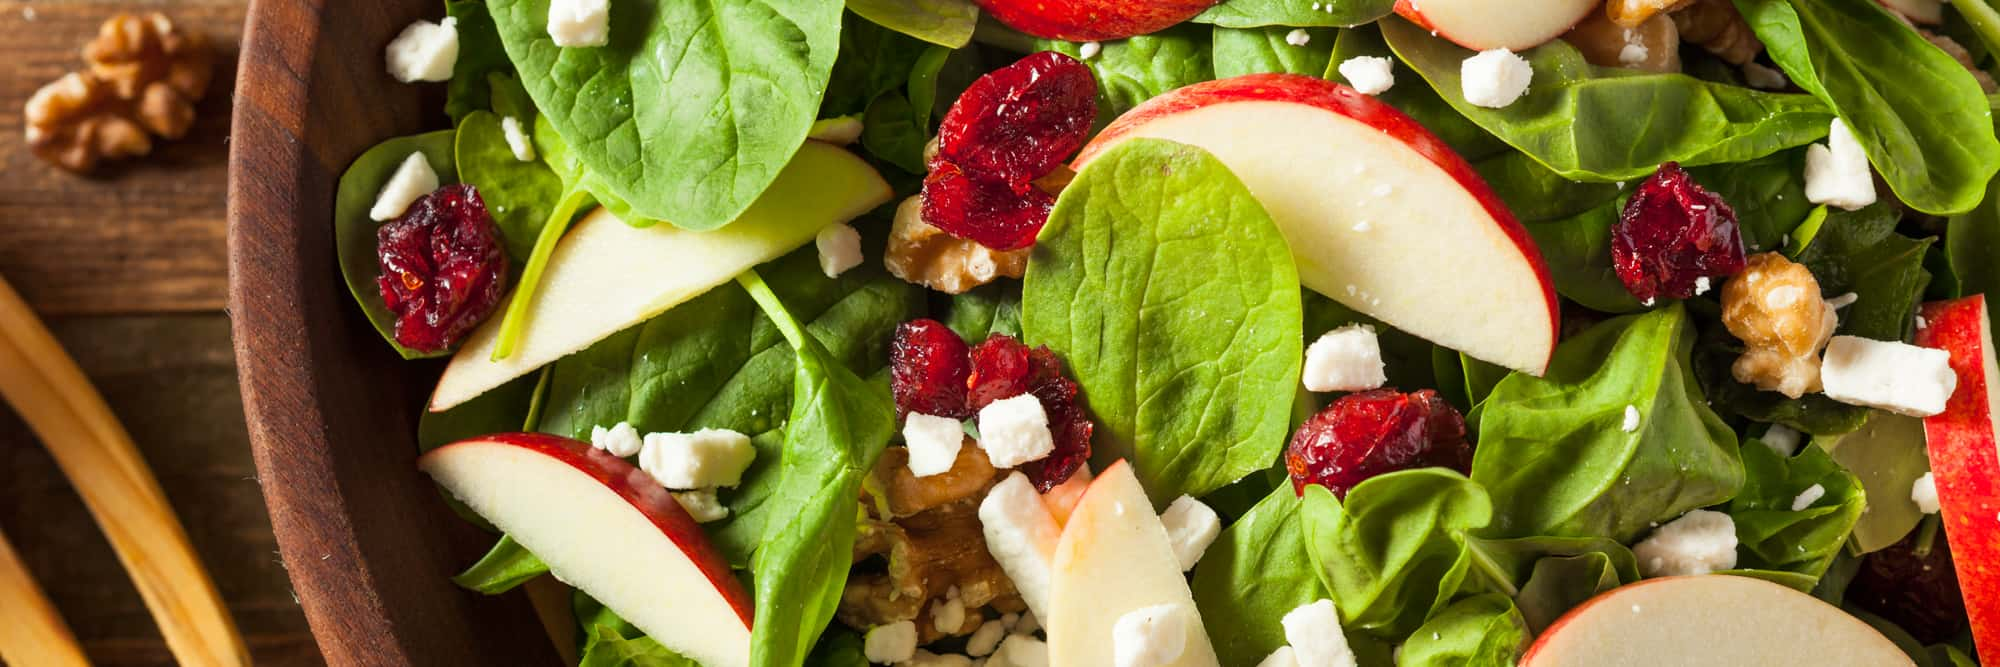 Taste Catering Menus Salads